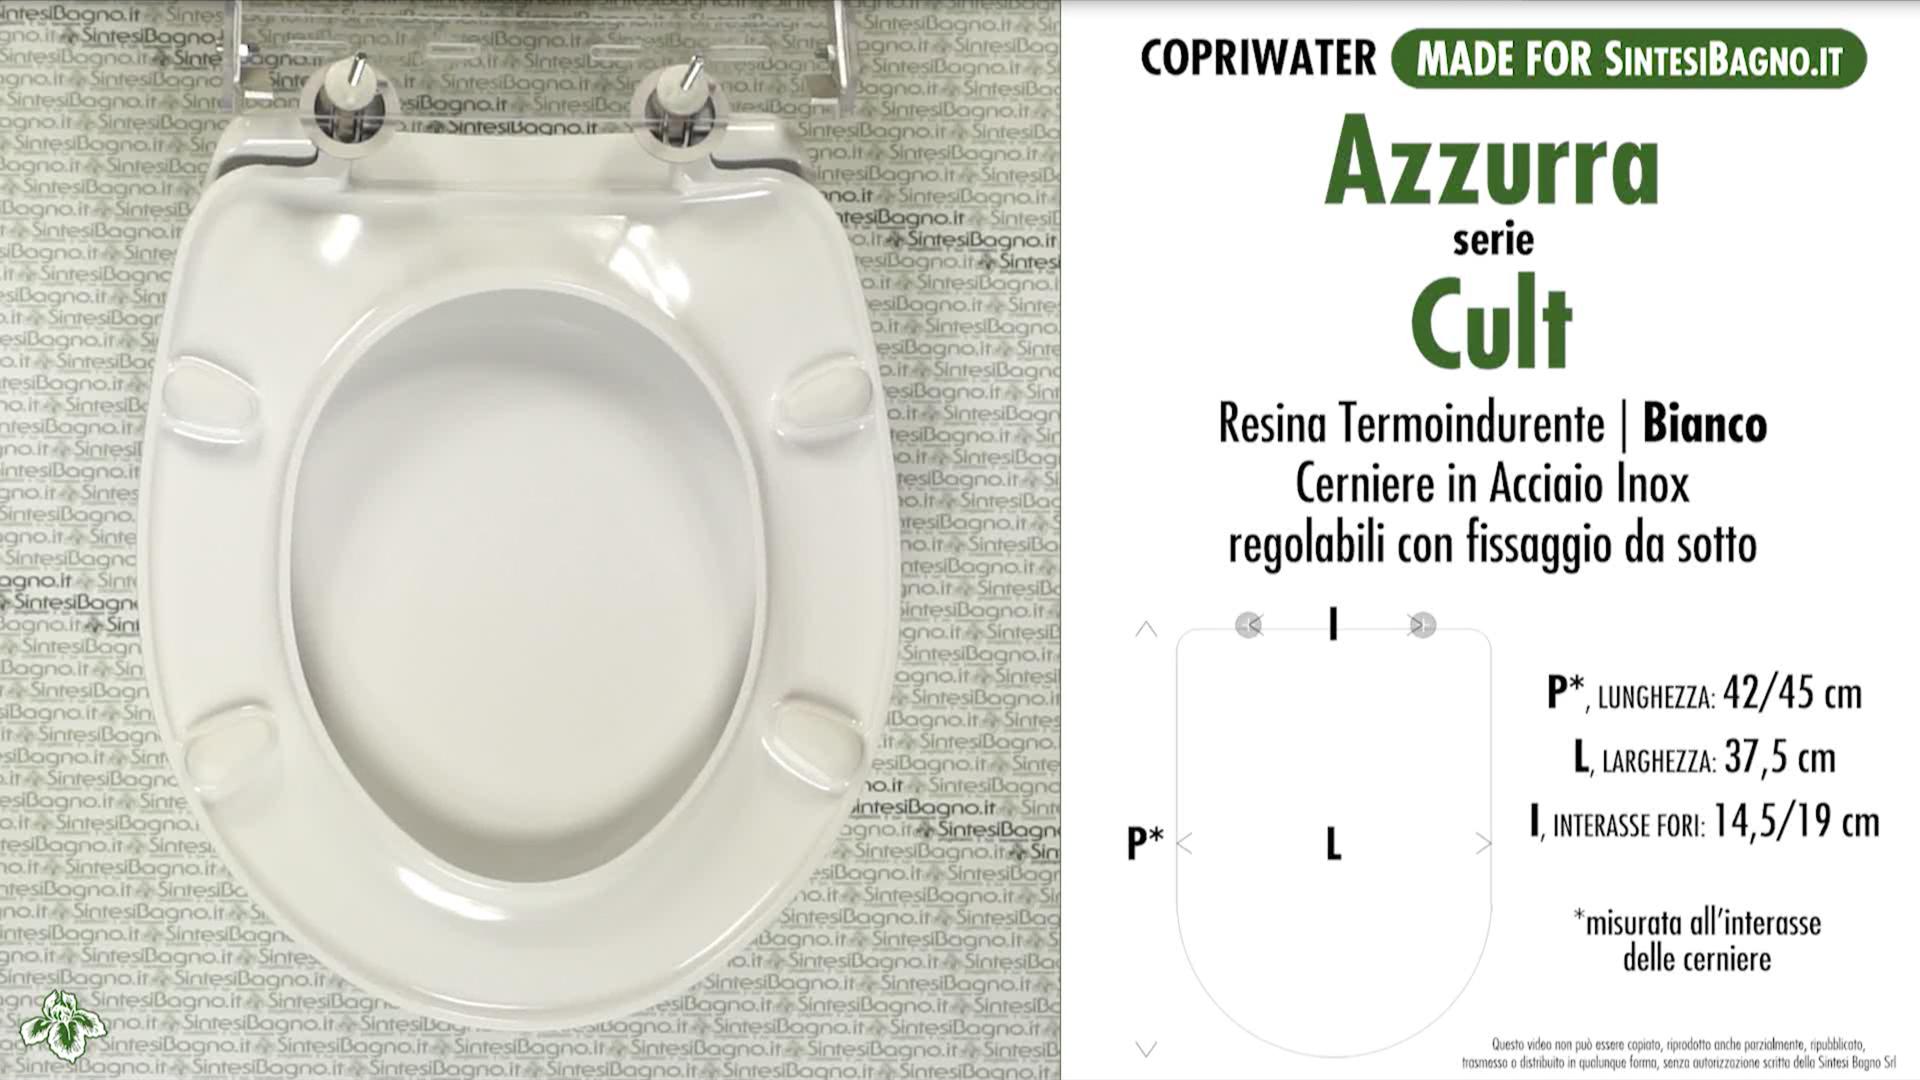 SCHEDA TECNICA MISURE copriwater AZZURRA CULT